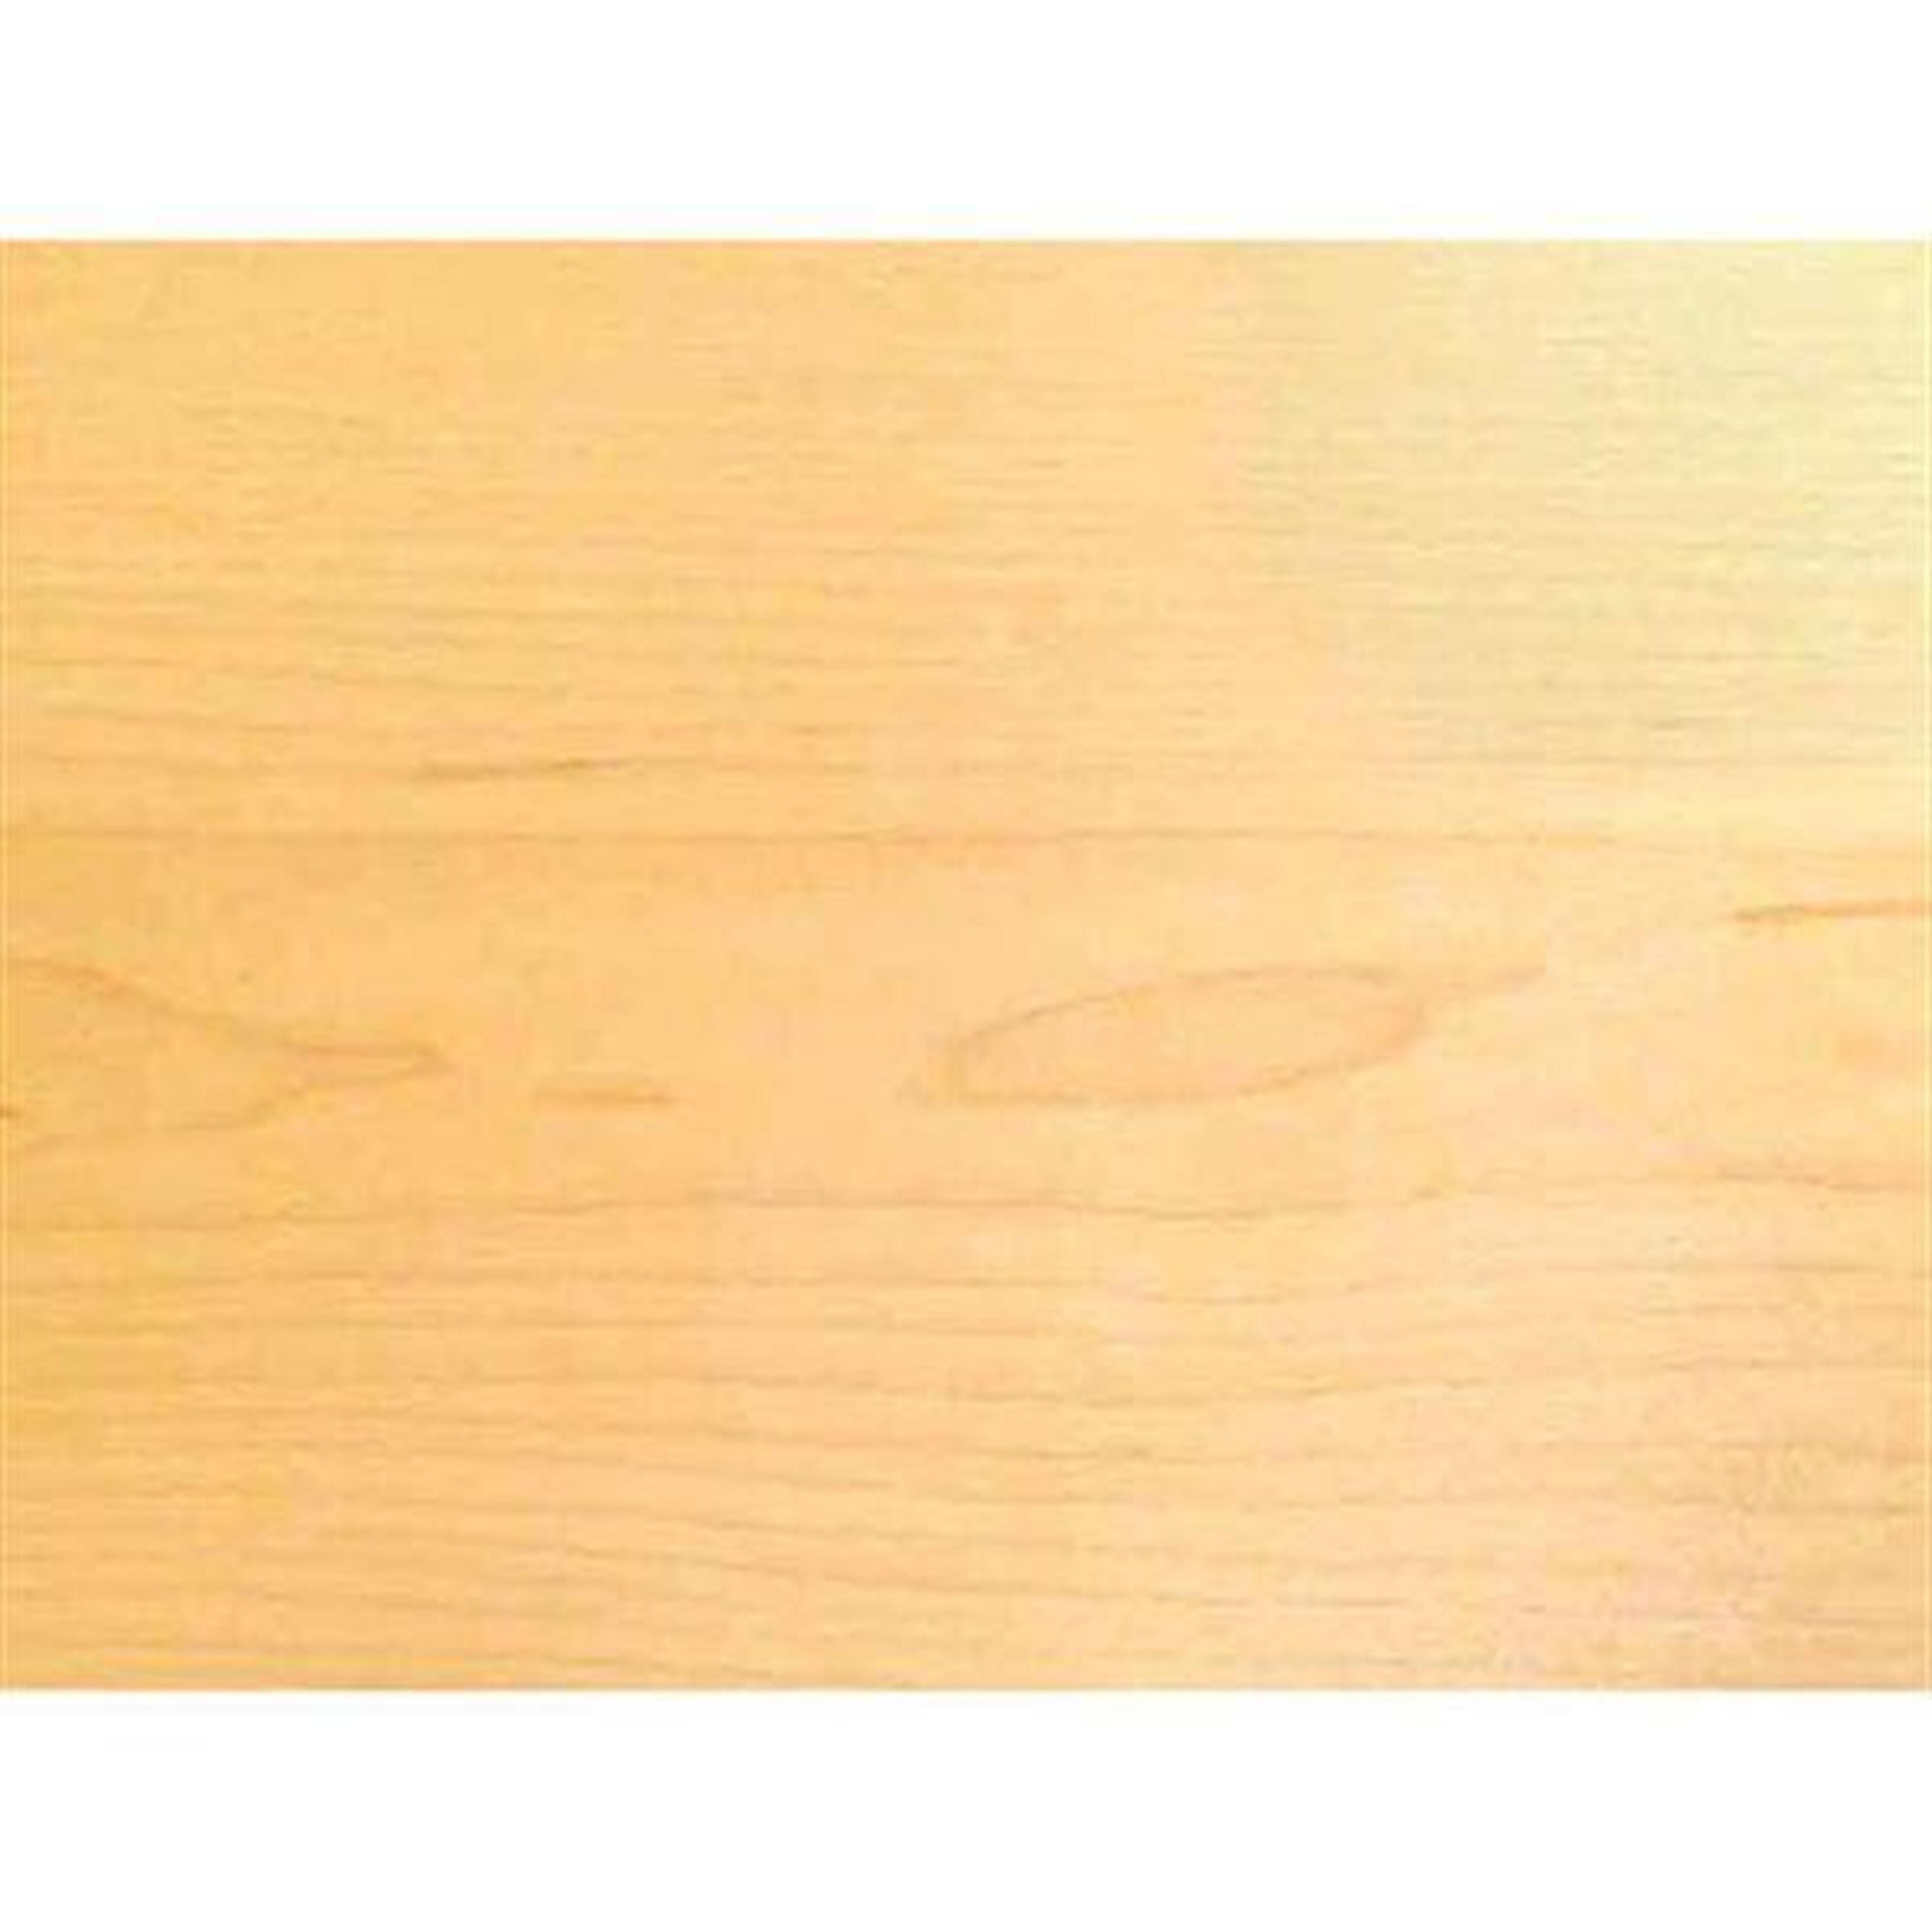 Maple 1' x 8' 3M? PSA Backed Flat Cut Wood Veneer